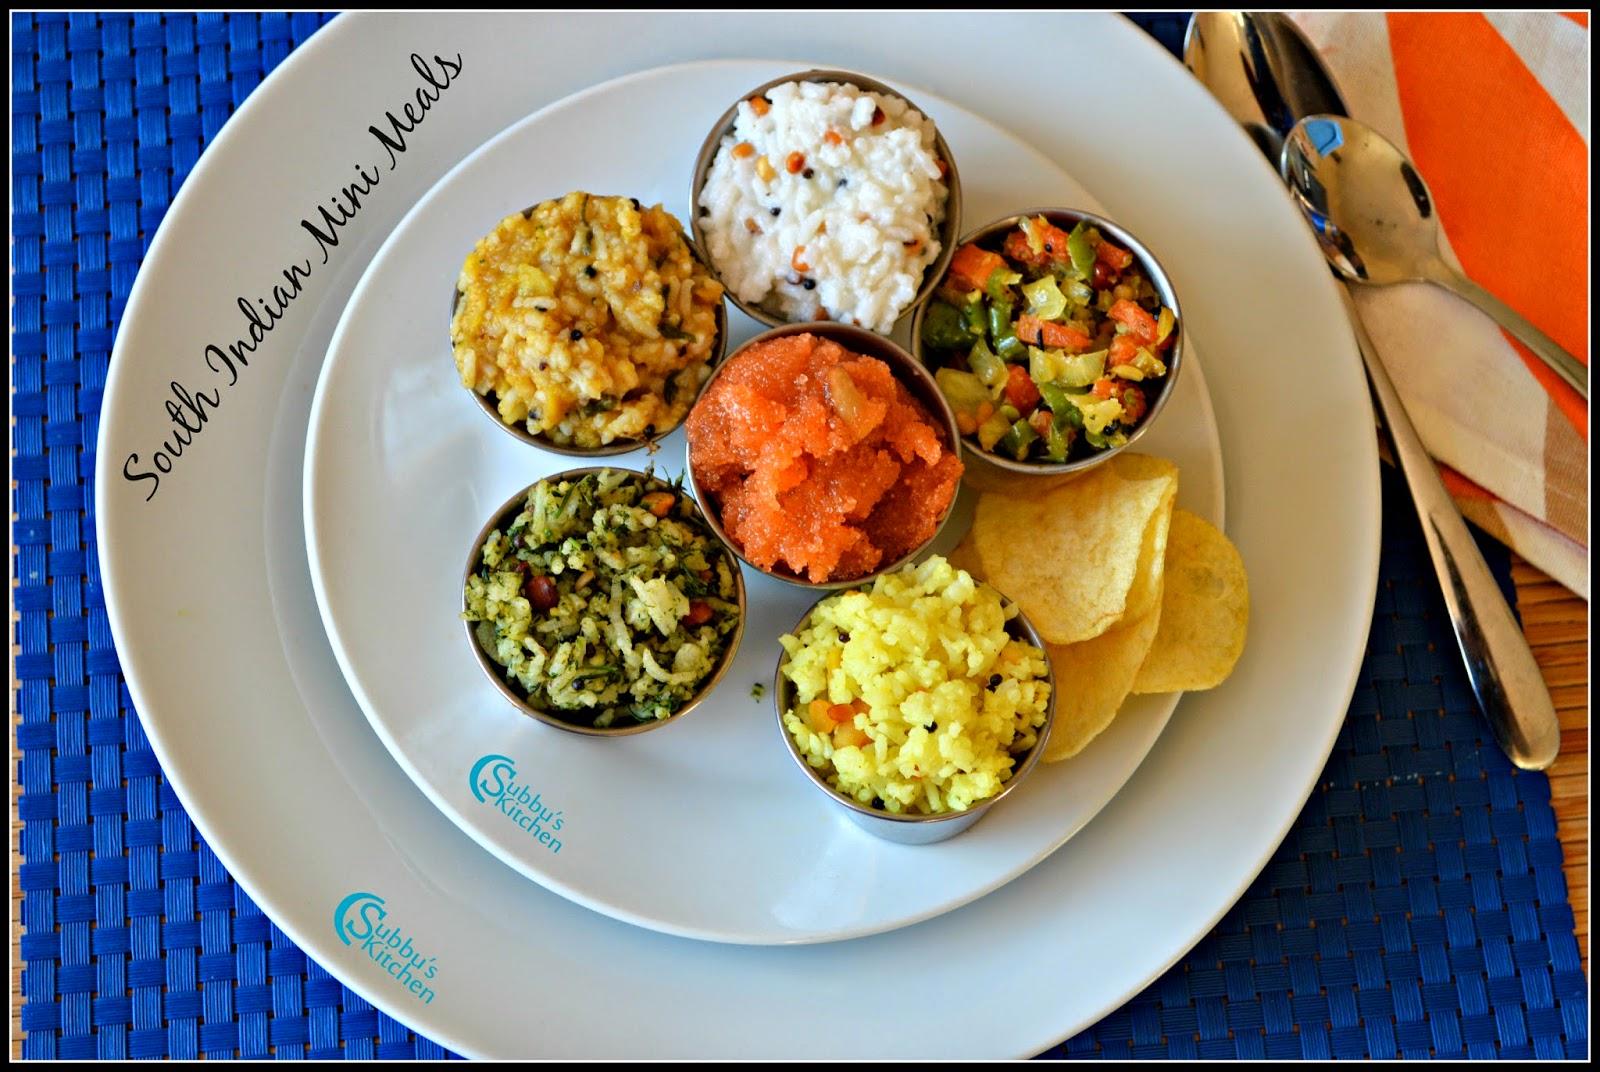 south indian lunch menu 14 southindian mini meals kesari sambar